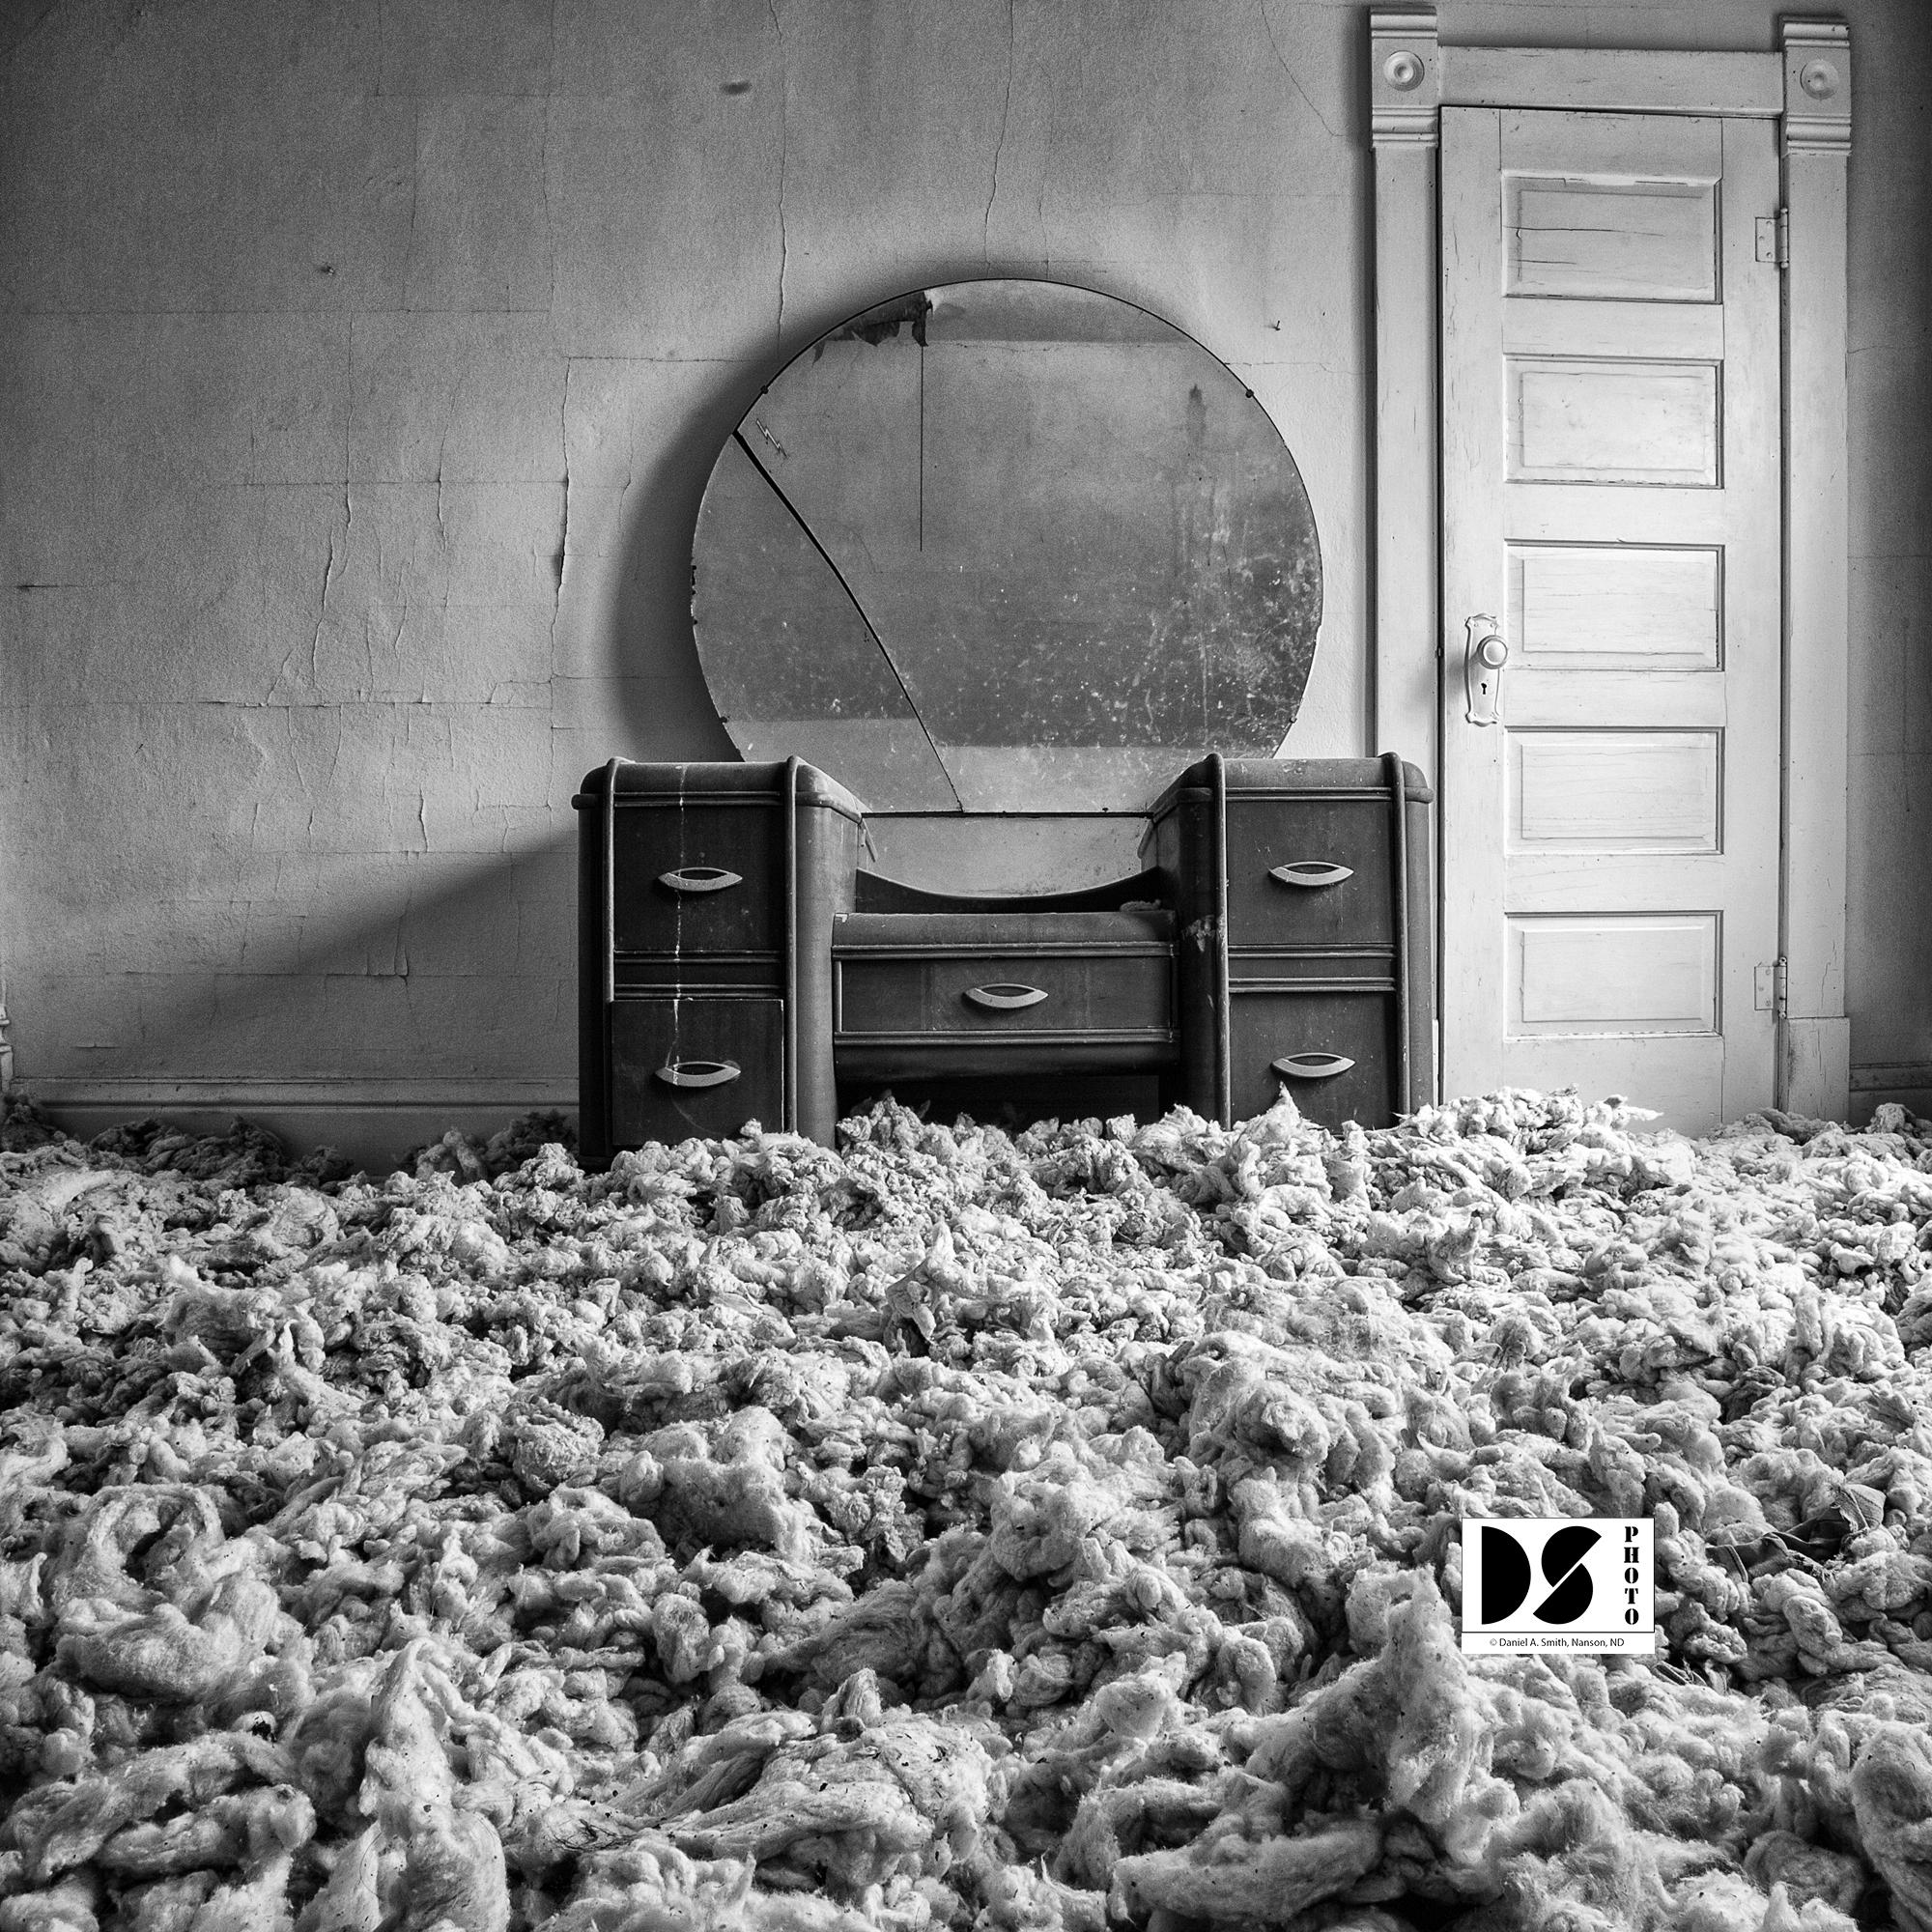 ©2020 Daniel A Smith, Vanity with Mirror